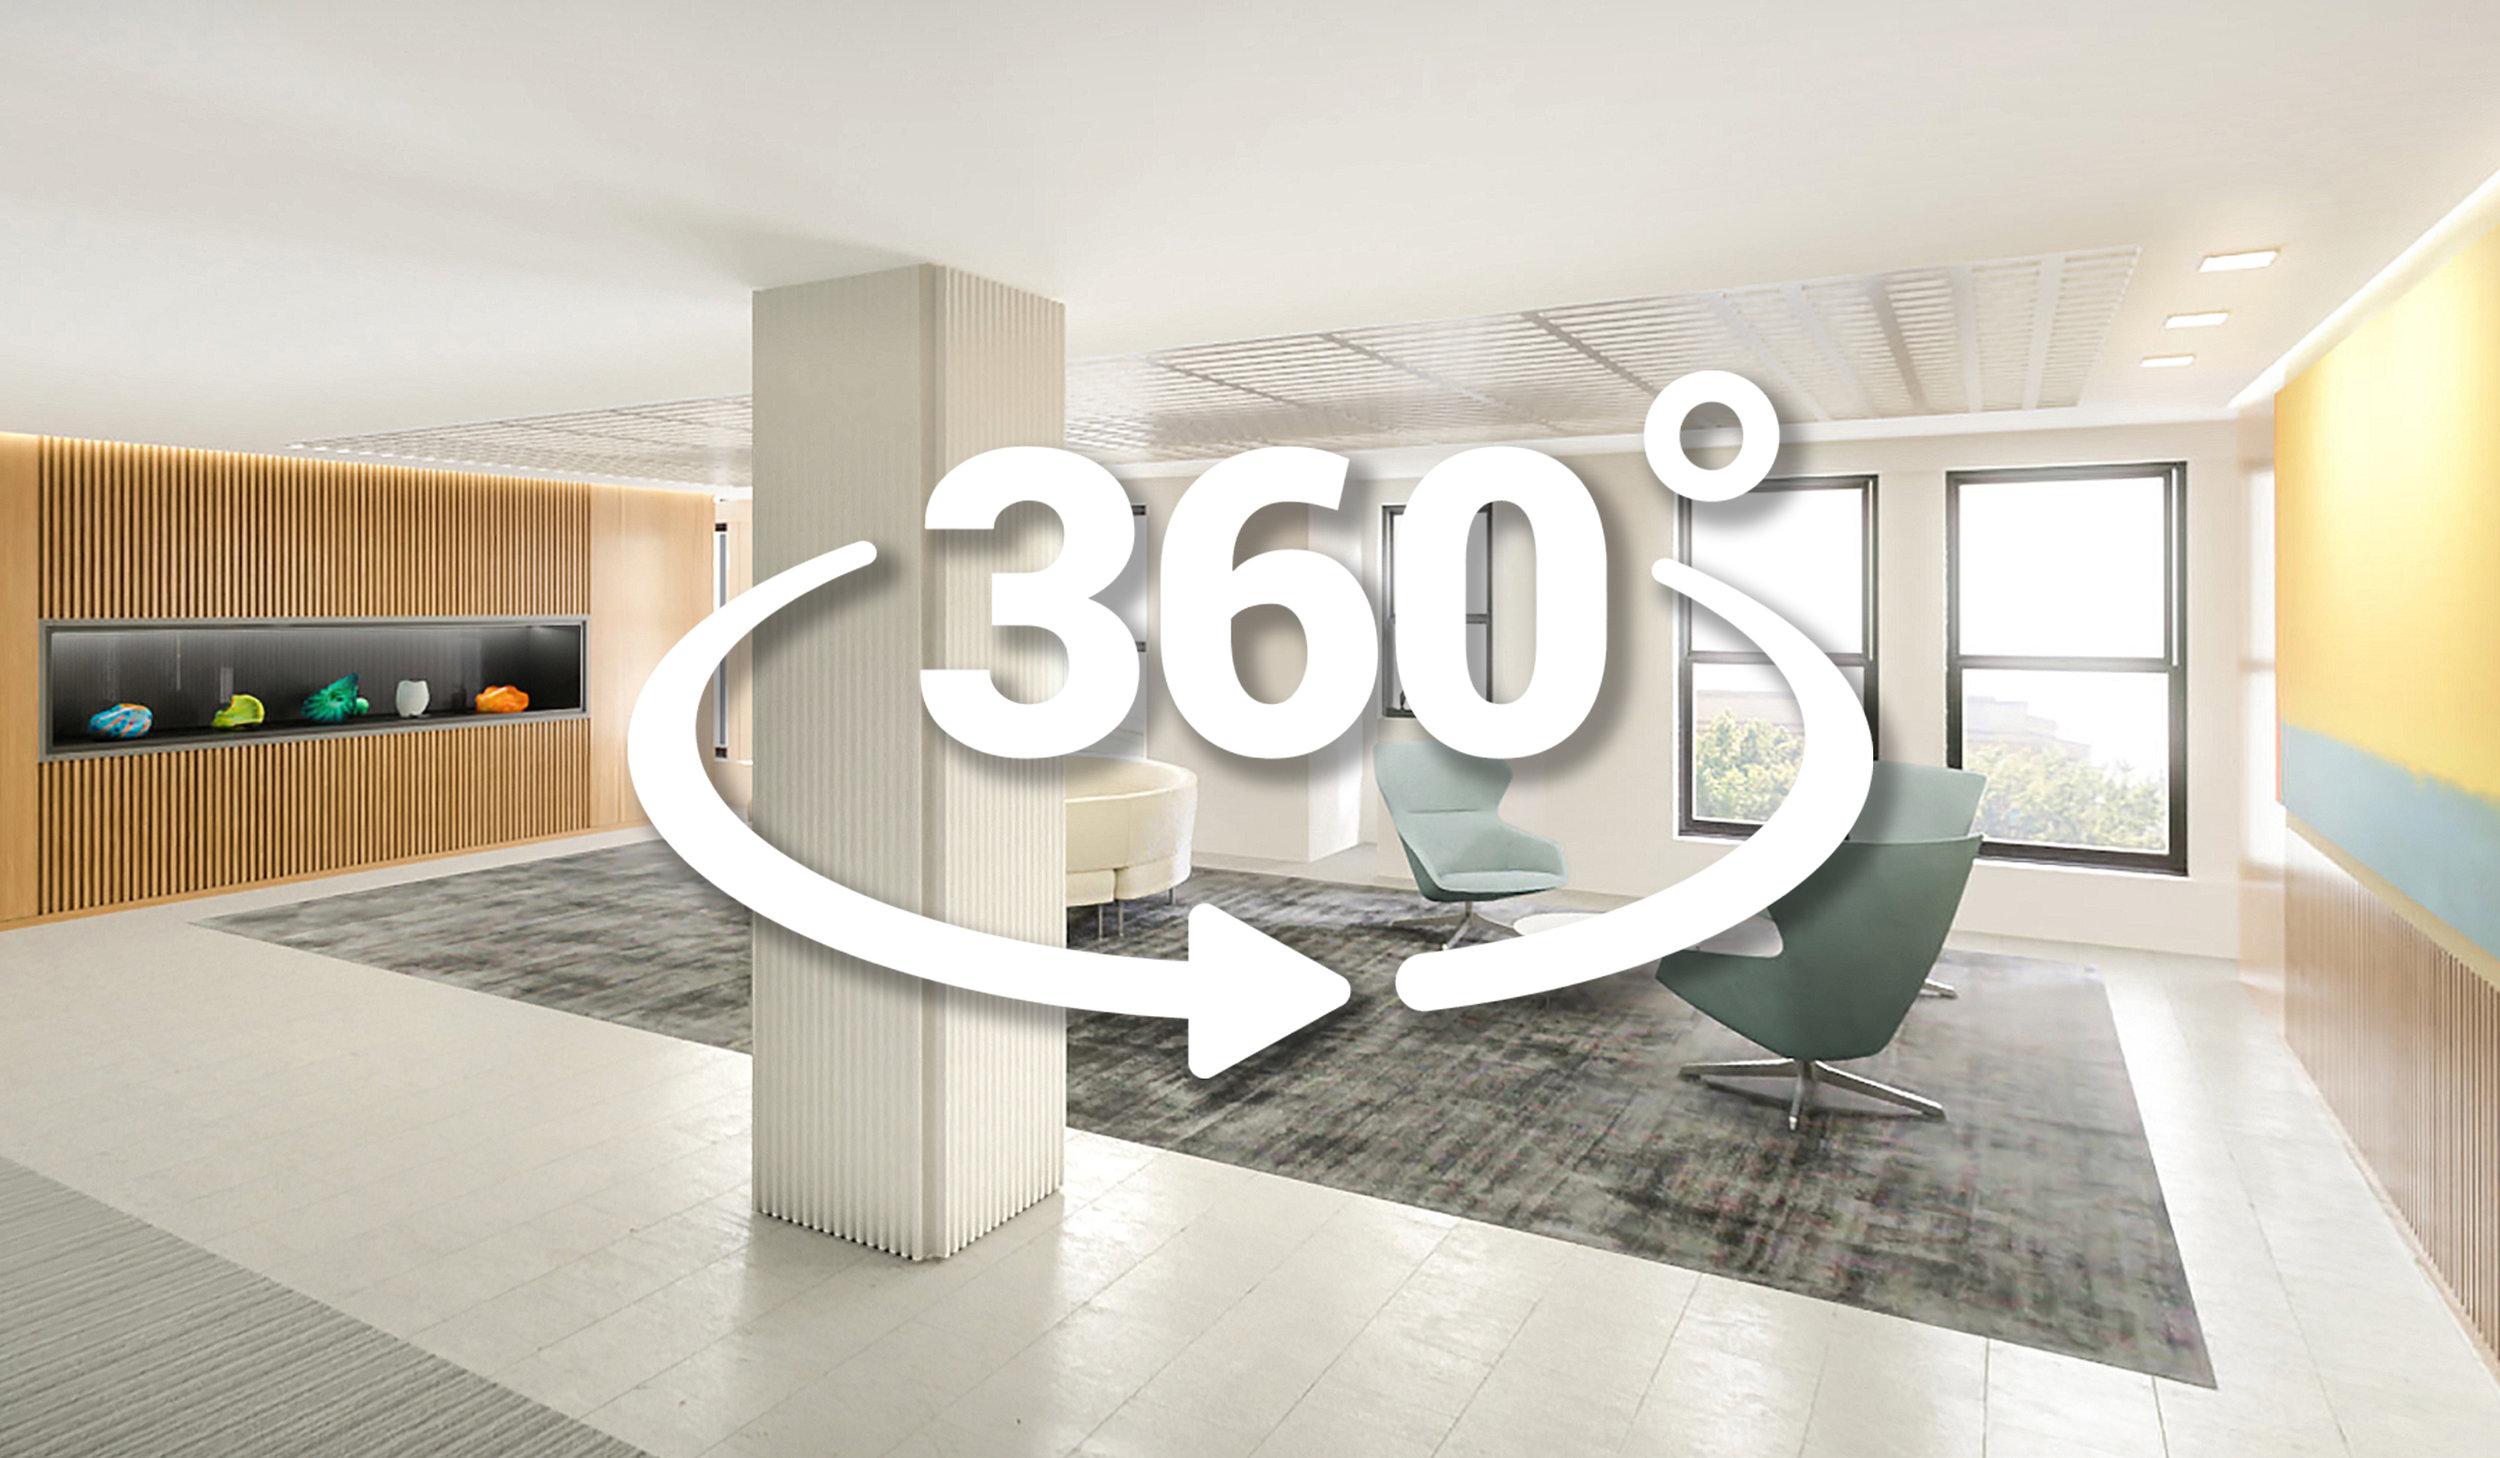 C A R L Y L E G R O U P   modeling, 360° panorama, still illustrations, marketing   EXPLORE